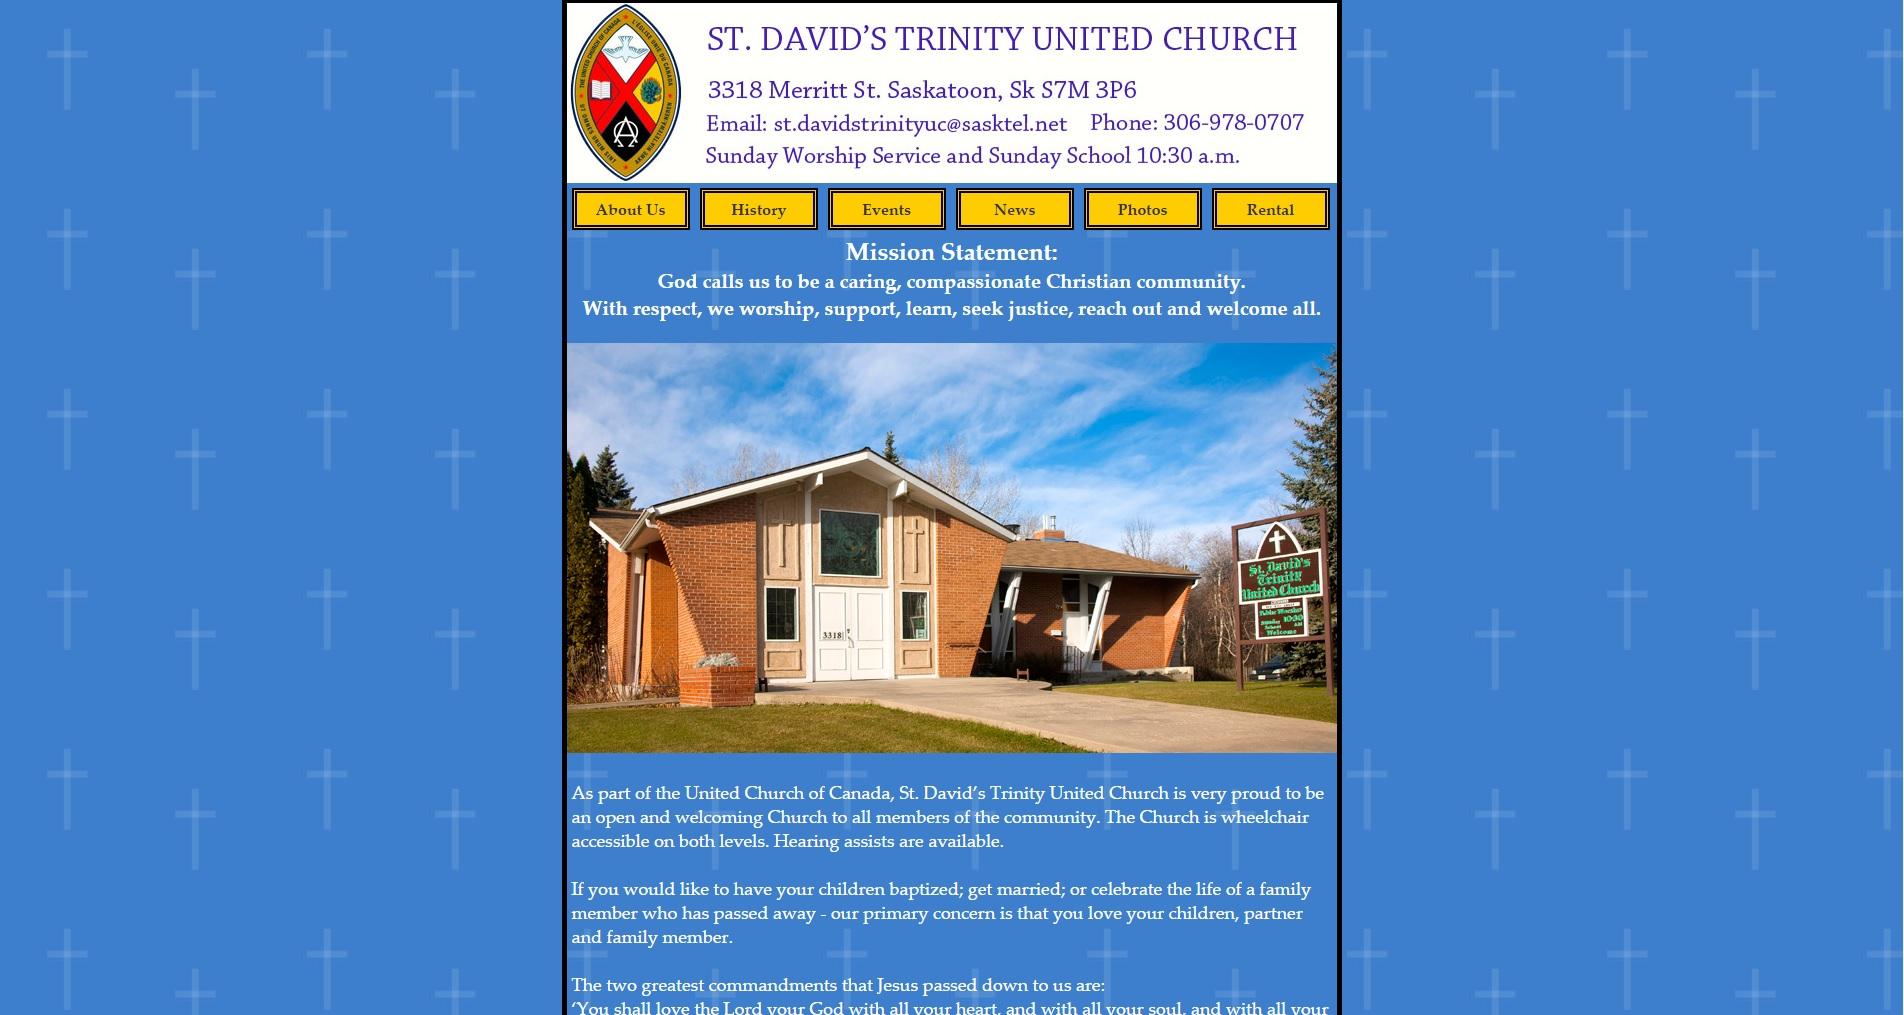 St. David's Trinity United Church Website